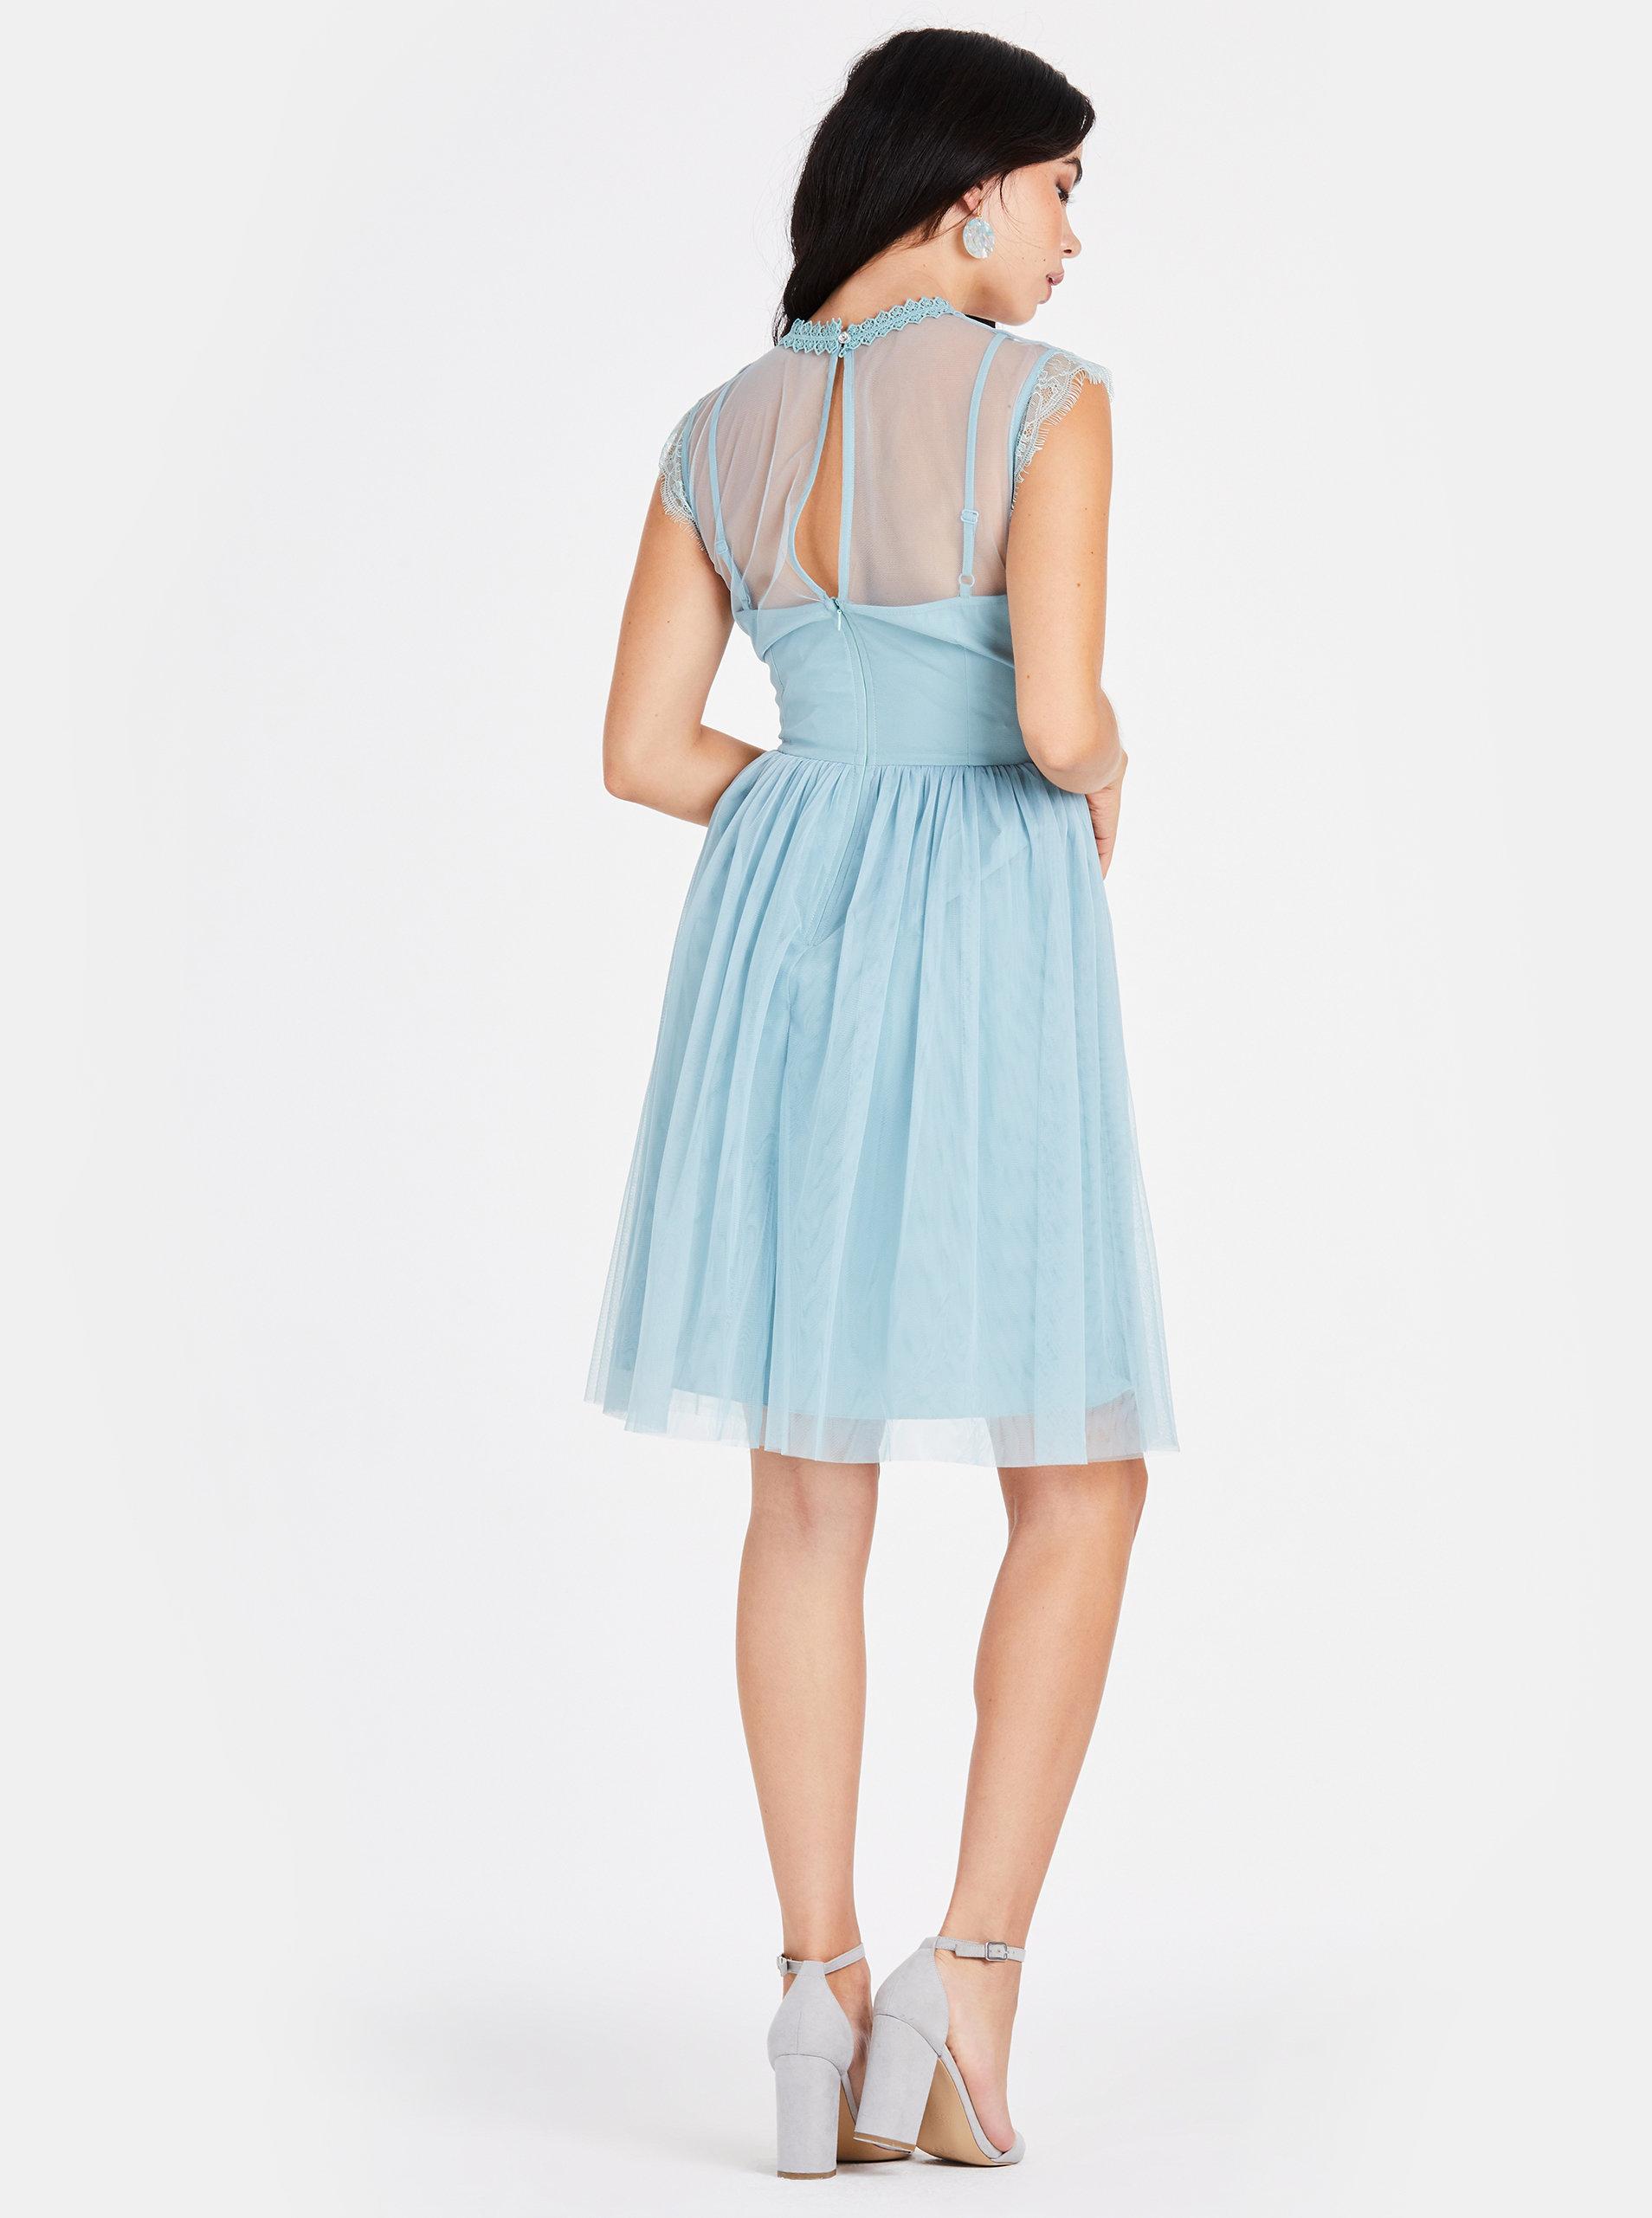 5283eda54b3c Svetlomodré šaty s čipkovaným topom Little Mistress ...